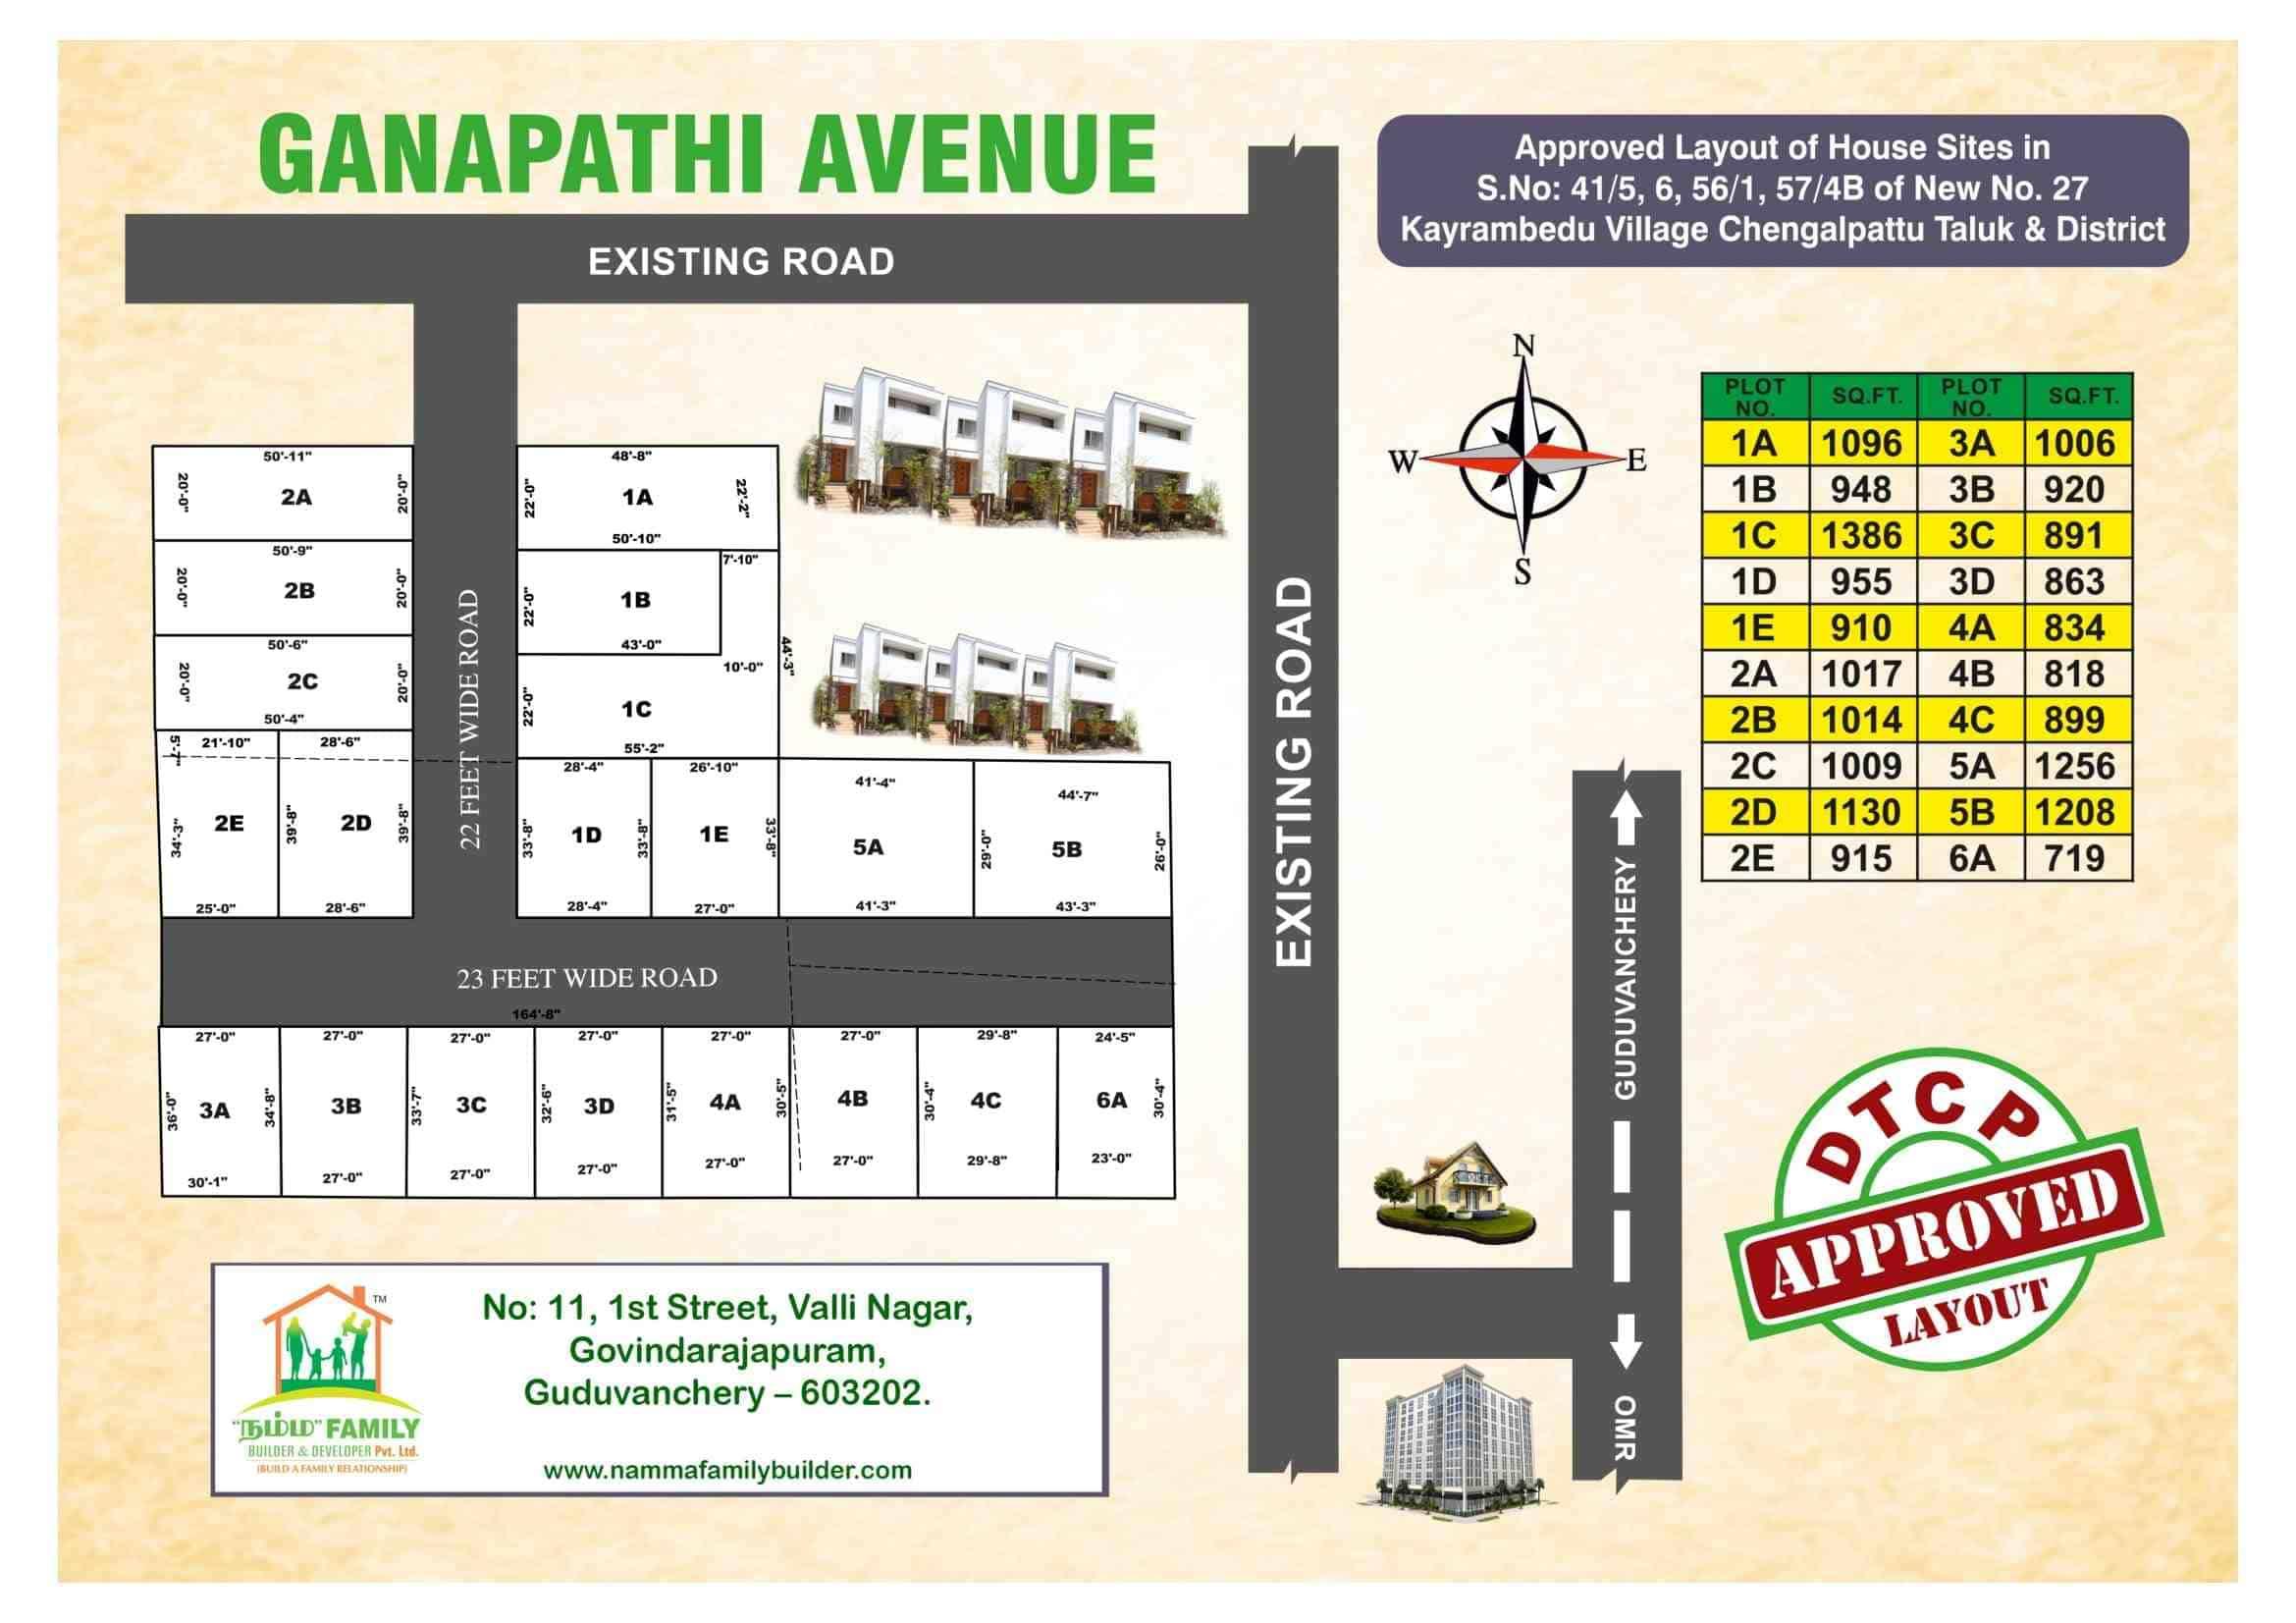 Ganapathi Avenue in Kayarambedu – Guduvanchery plots for sale